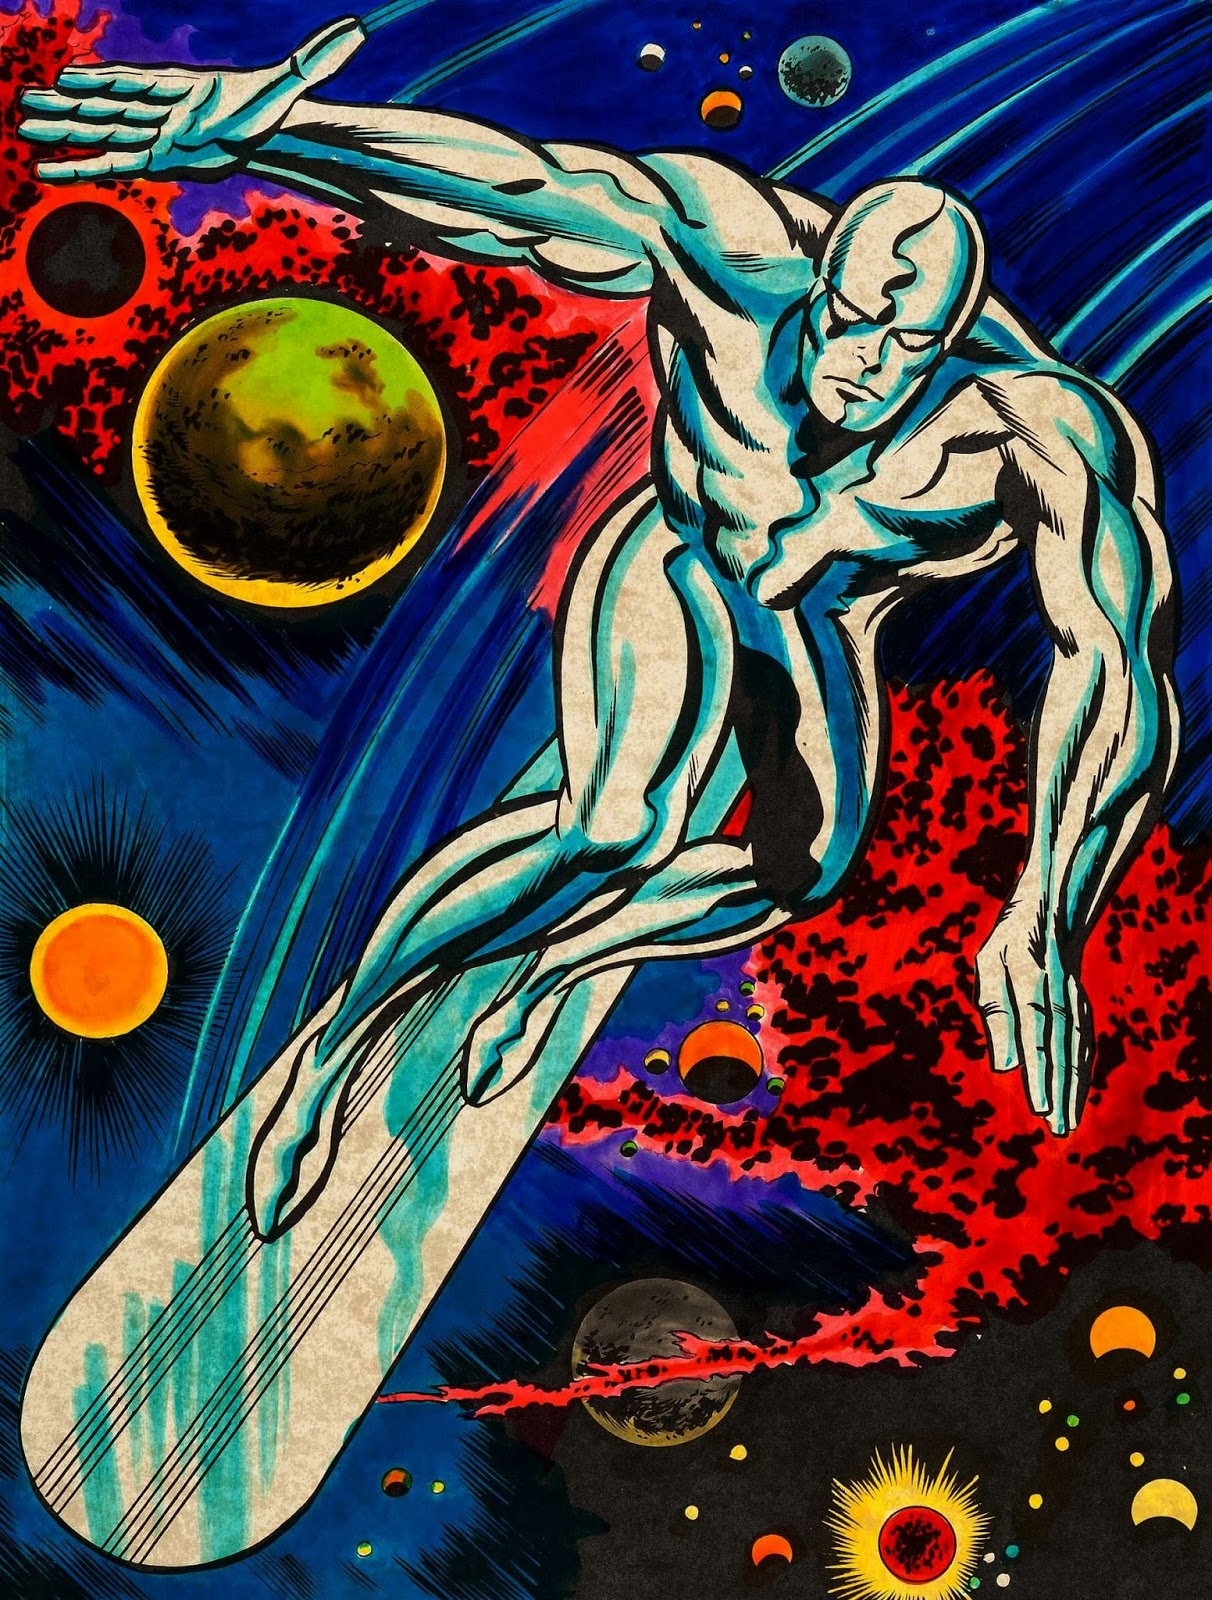 capns comics marvelmania silver surfer by jack kirby